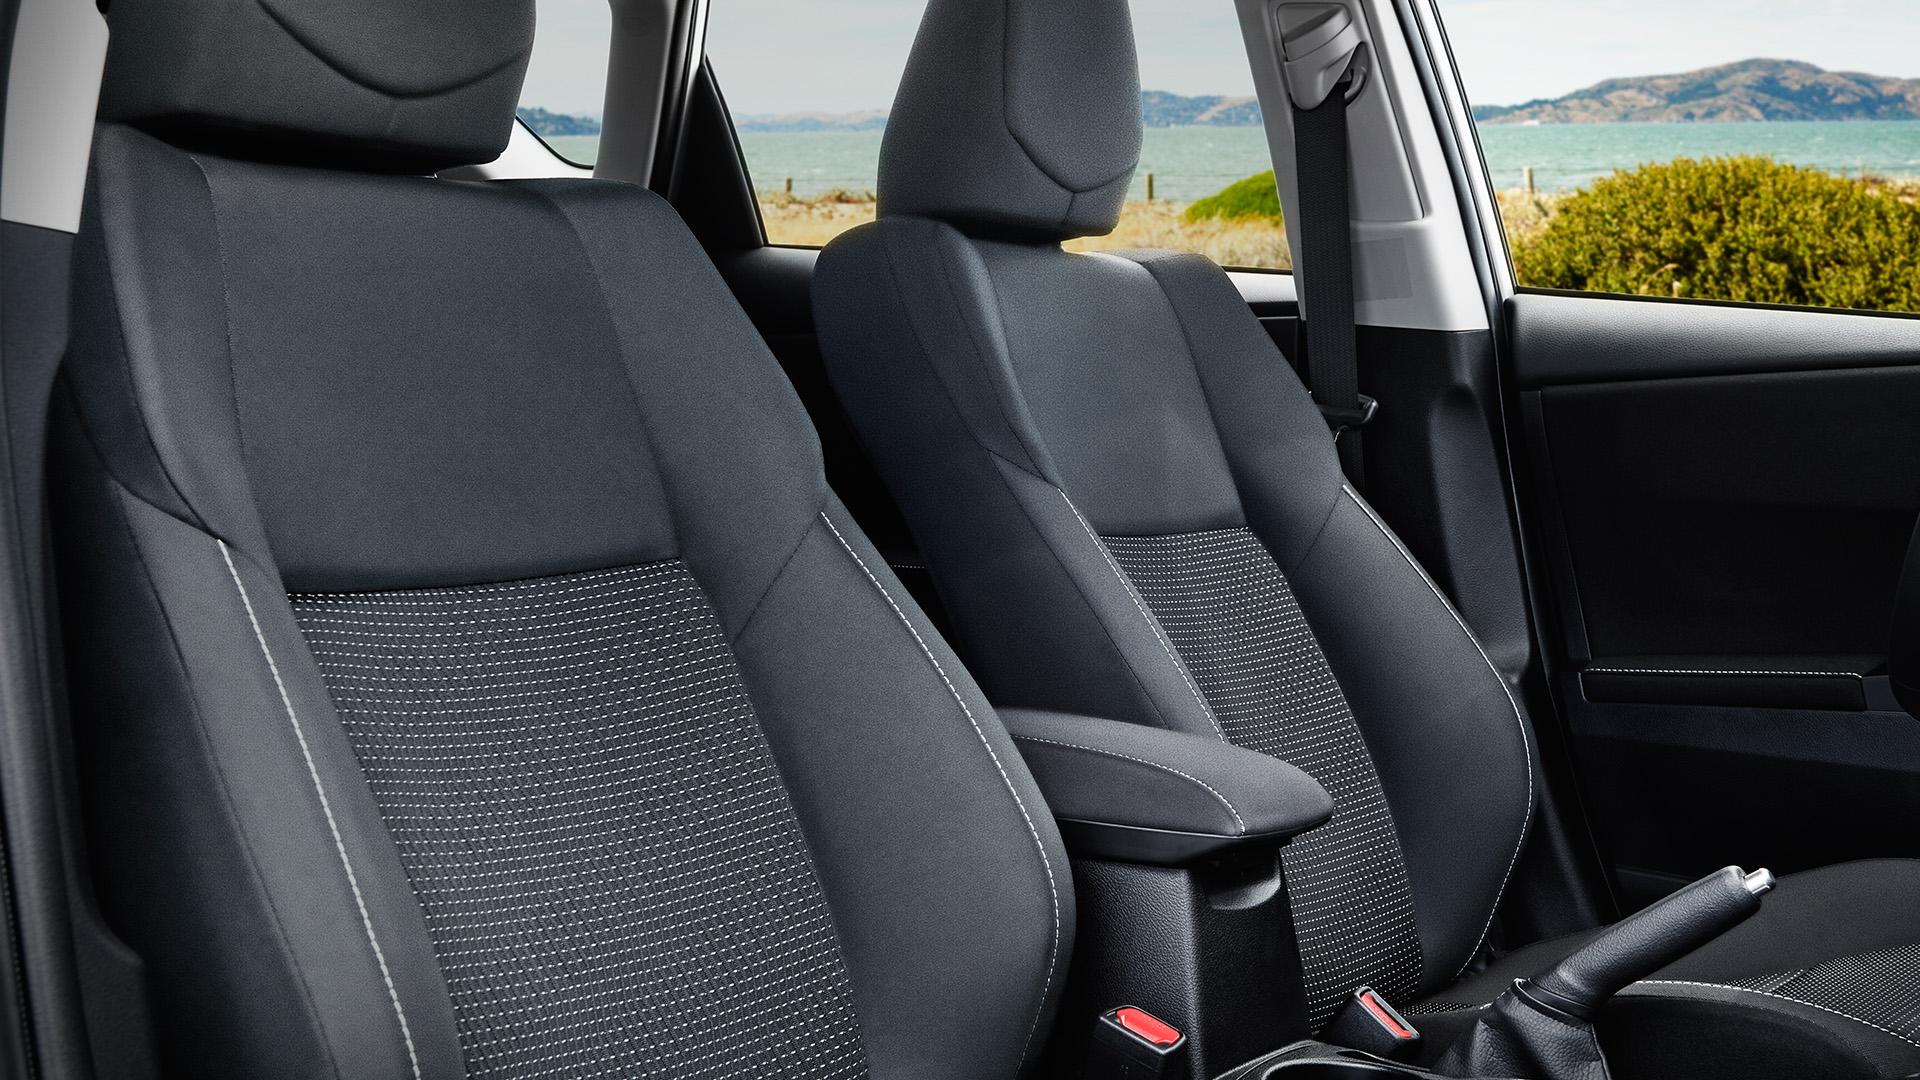 Sport Seats In The Corolla IM